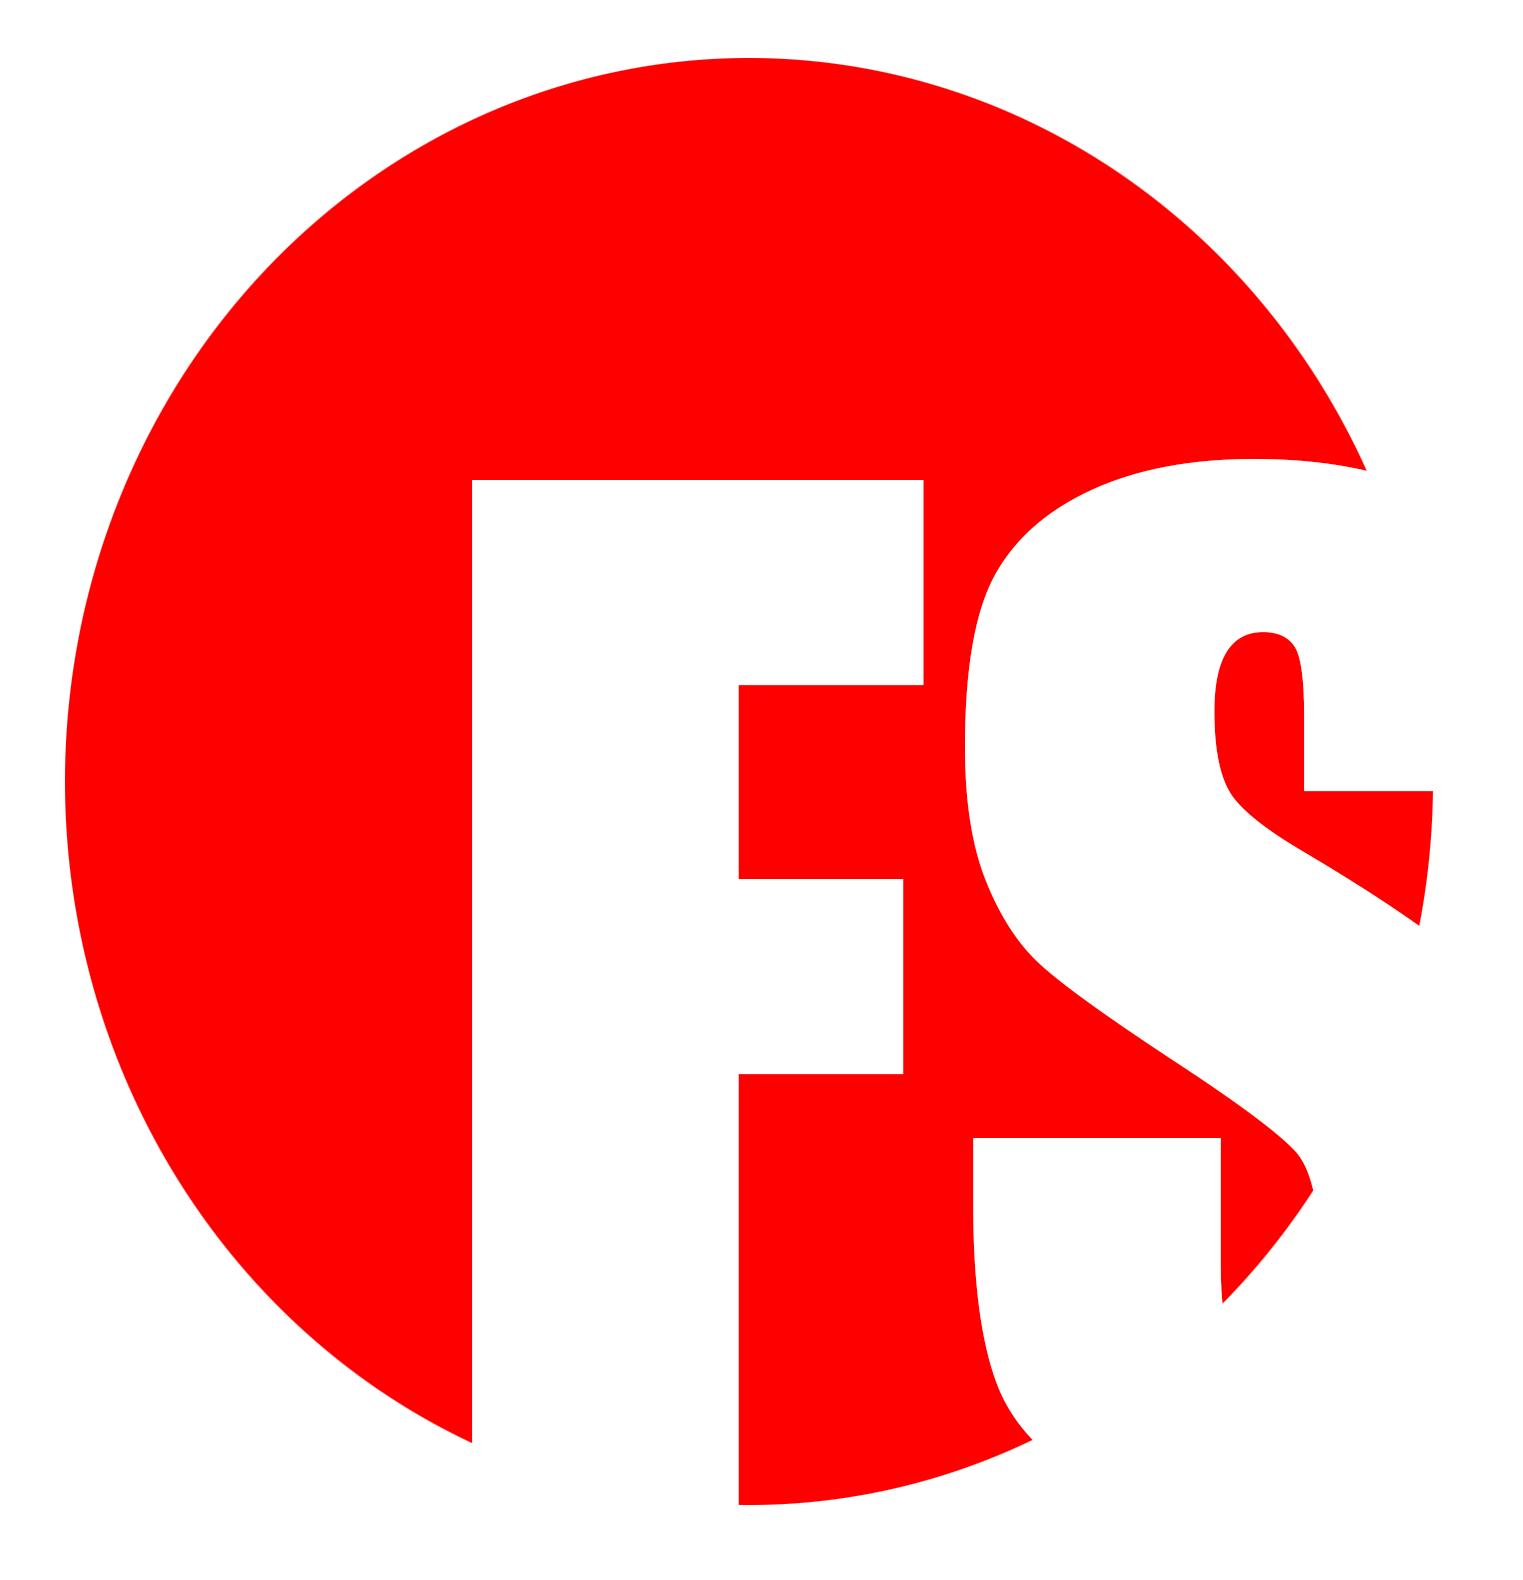 Logo du street photographer Frédéric Saez